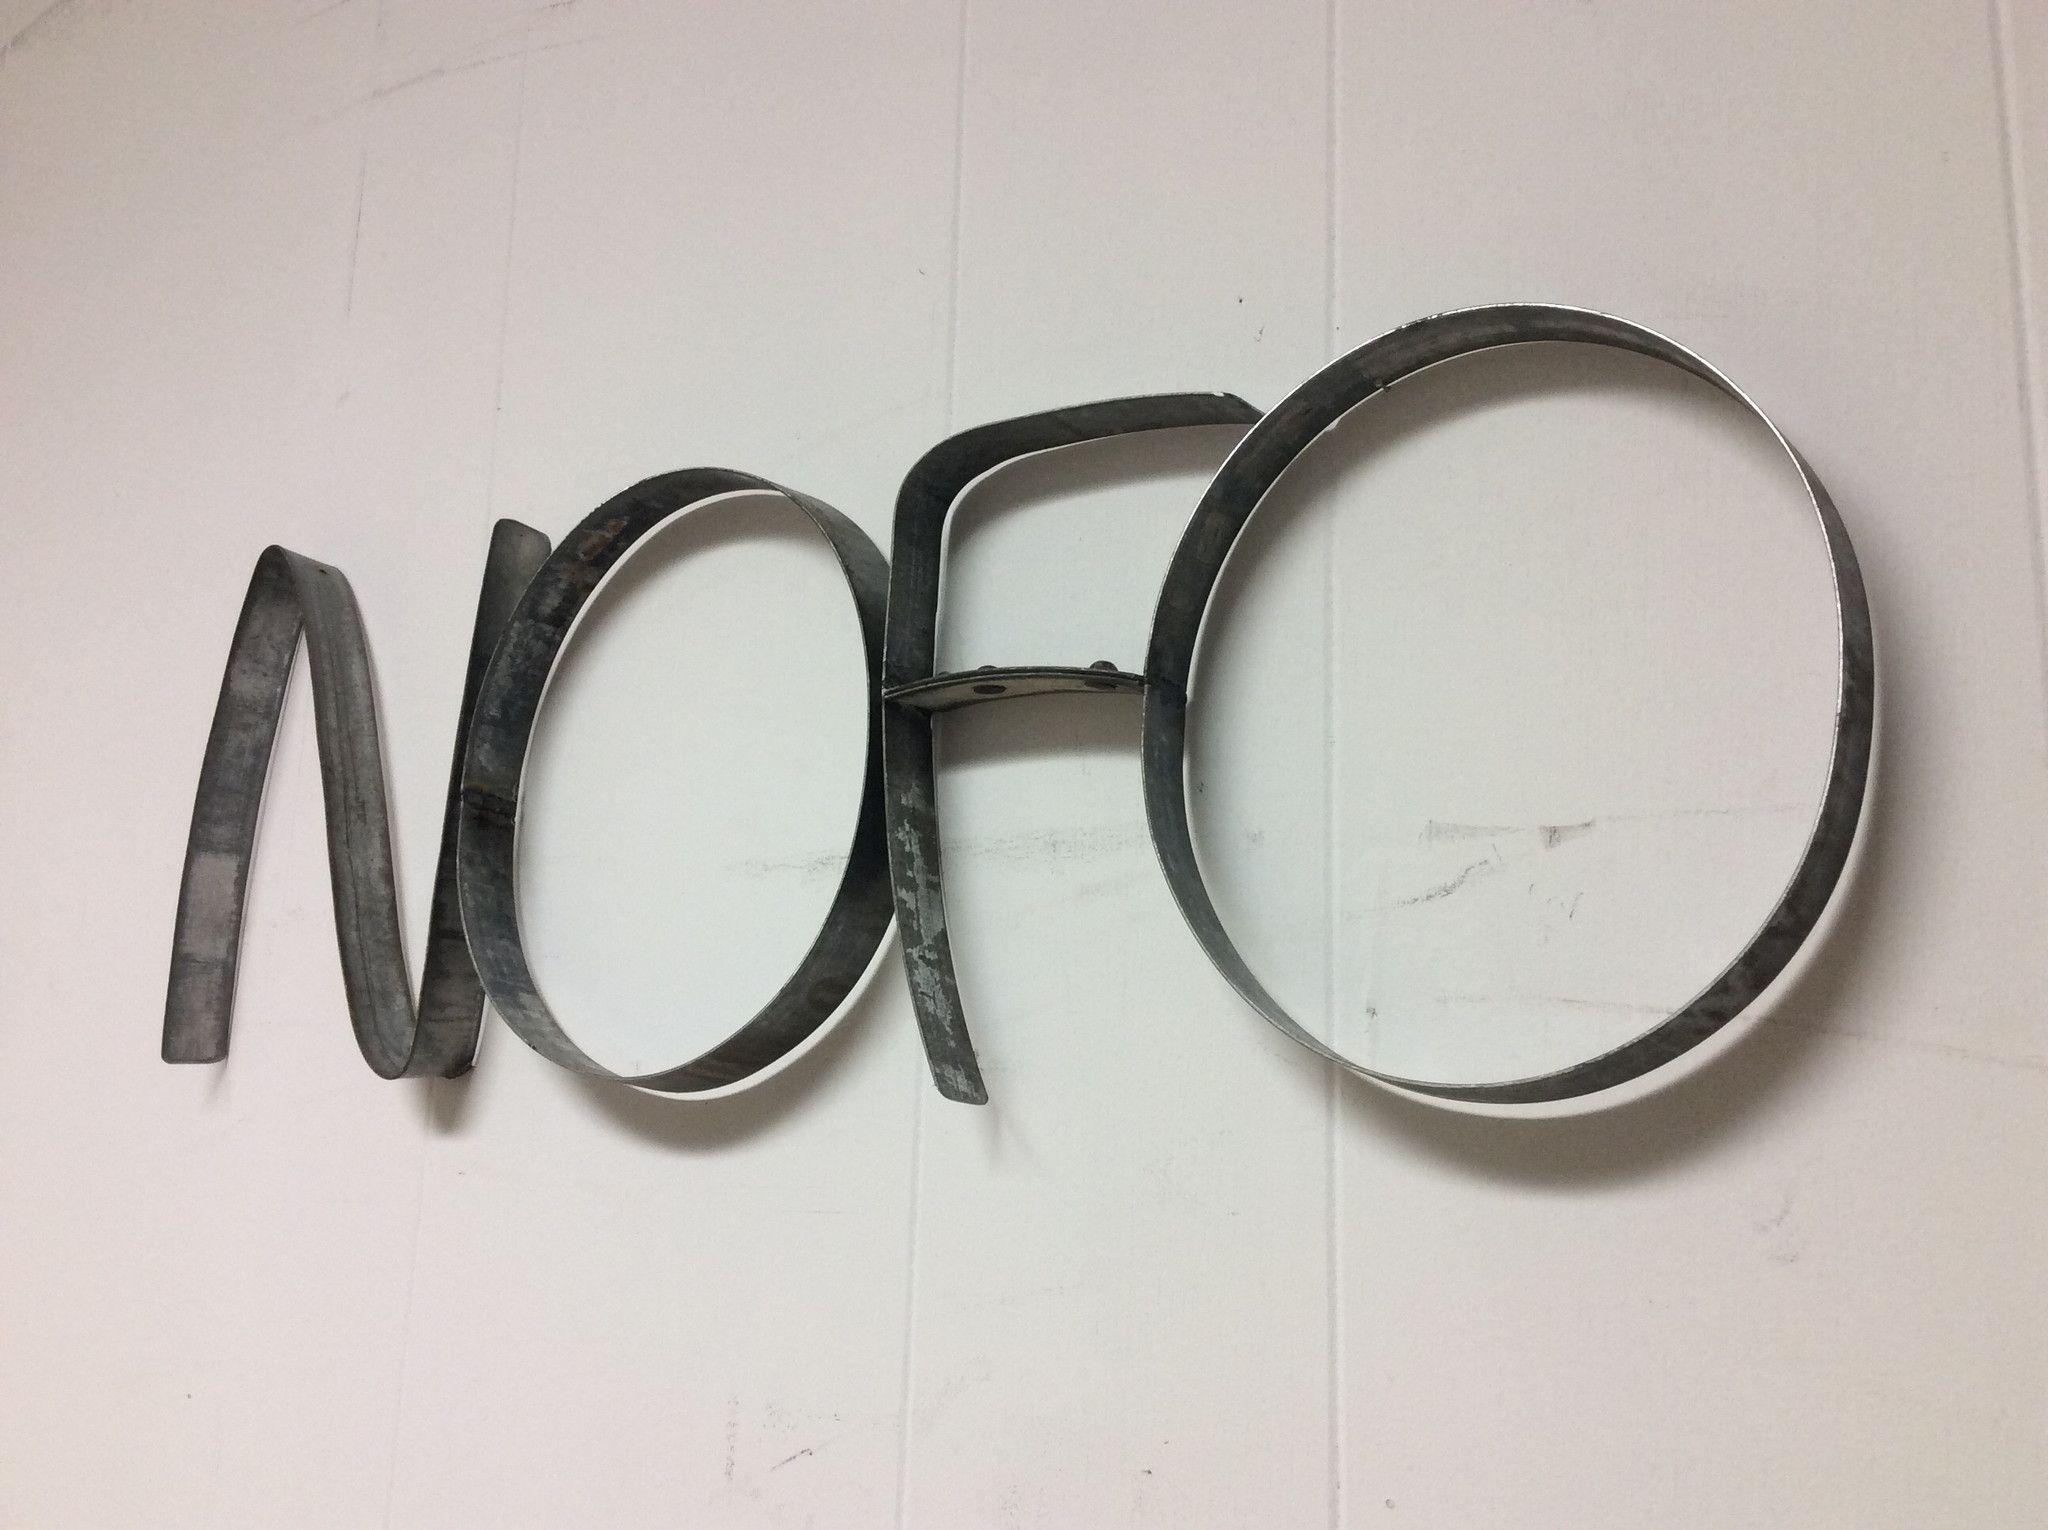 Nofo barrel ring wall art inspired by long islandus north fork